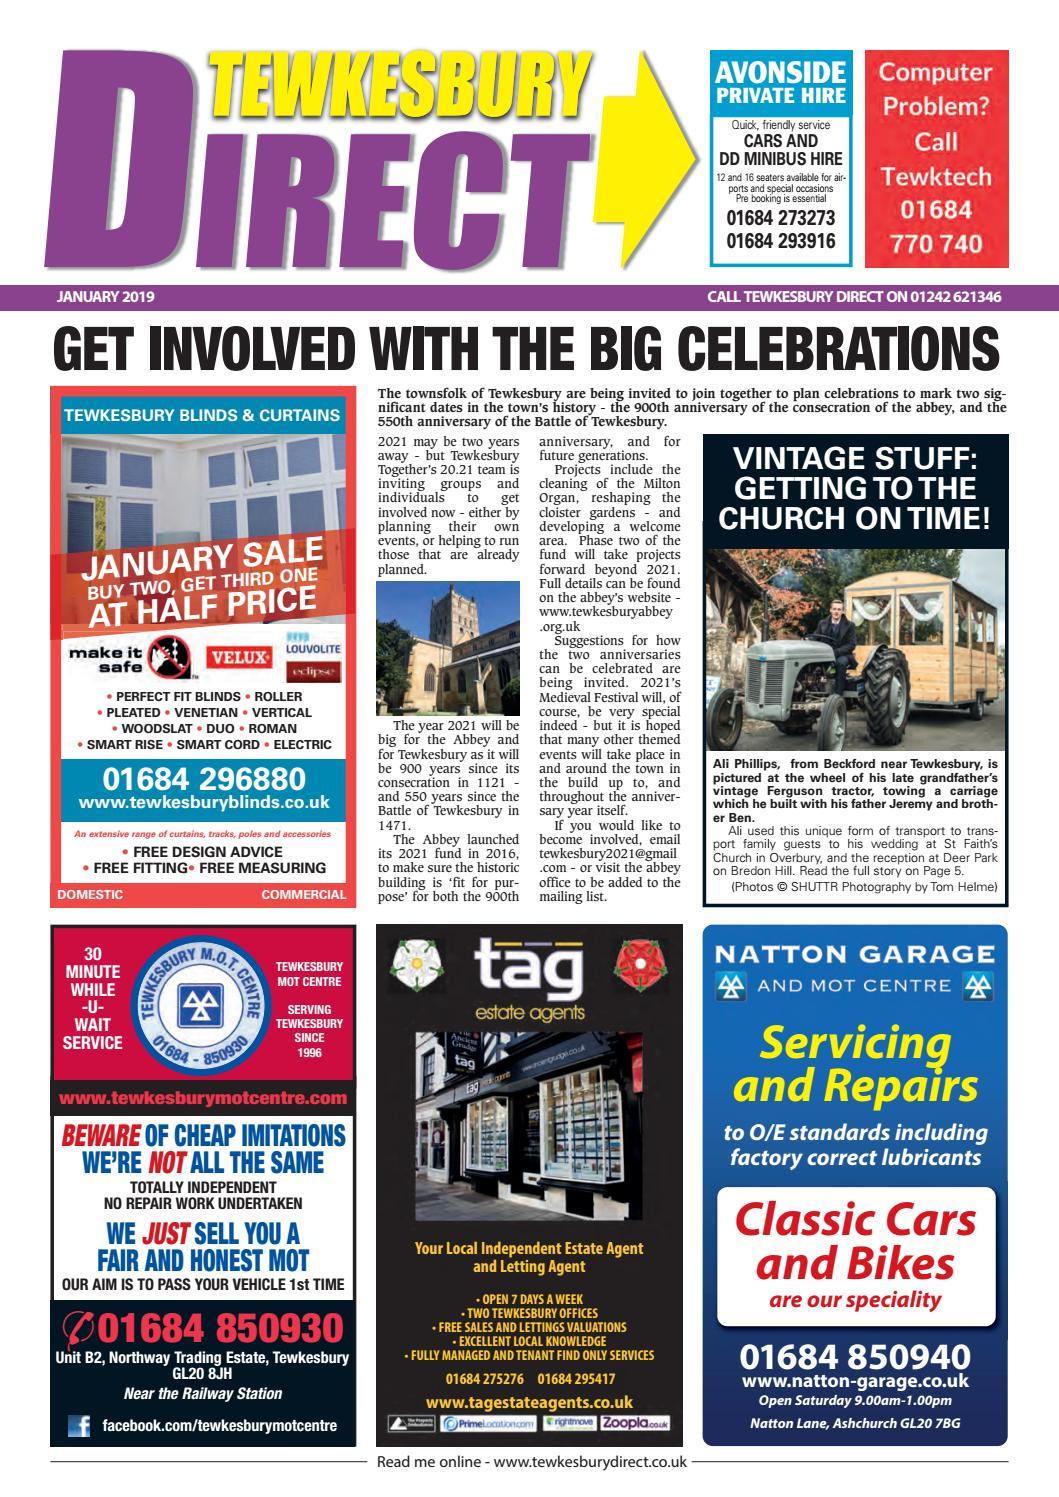 Tewkesbury Direct Magazine January 2019 by Tewkesbury Direct